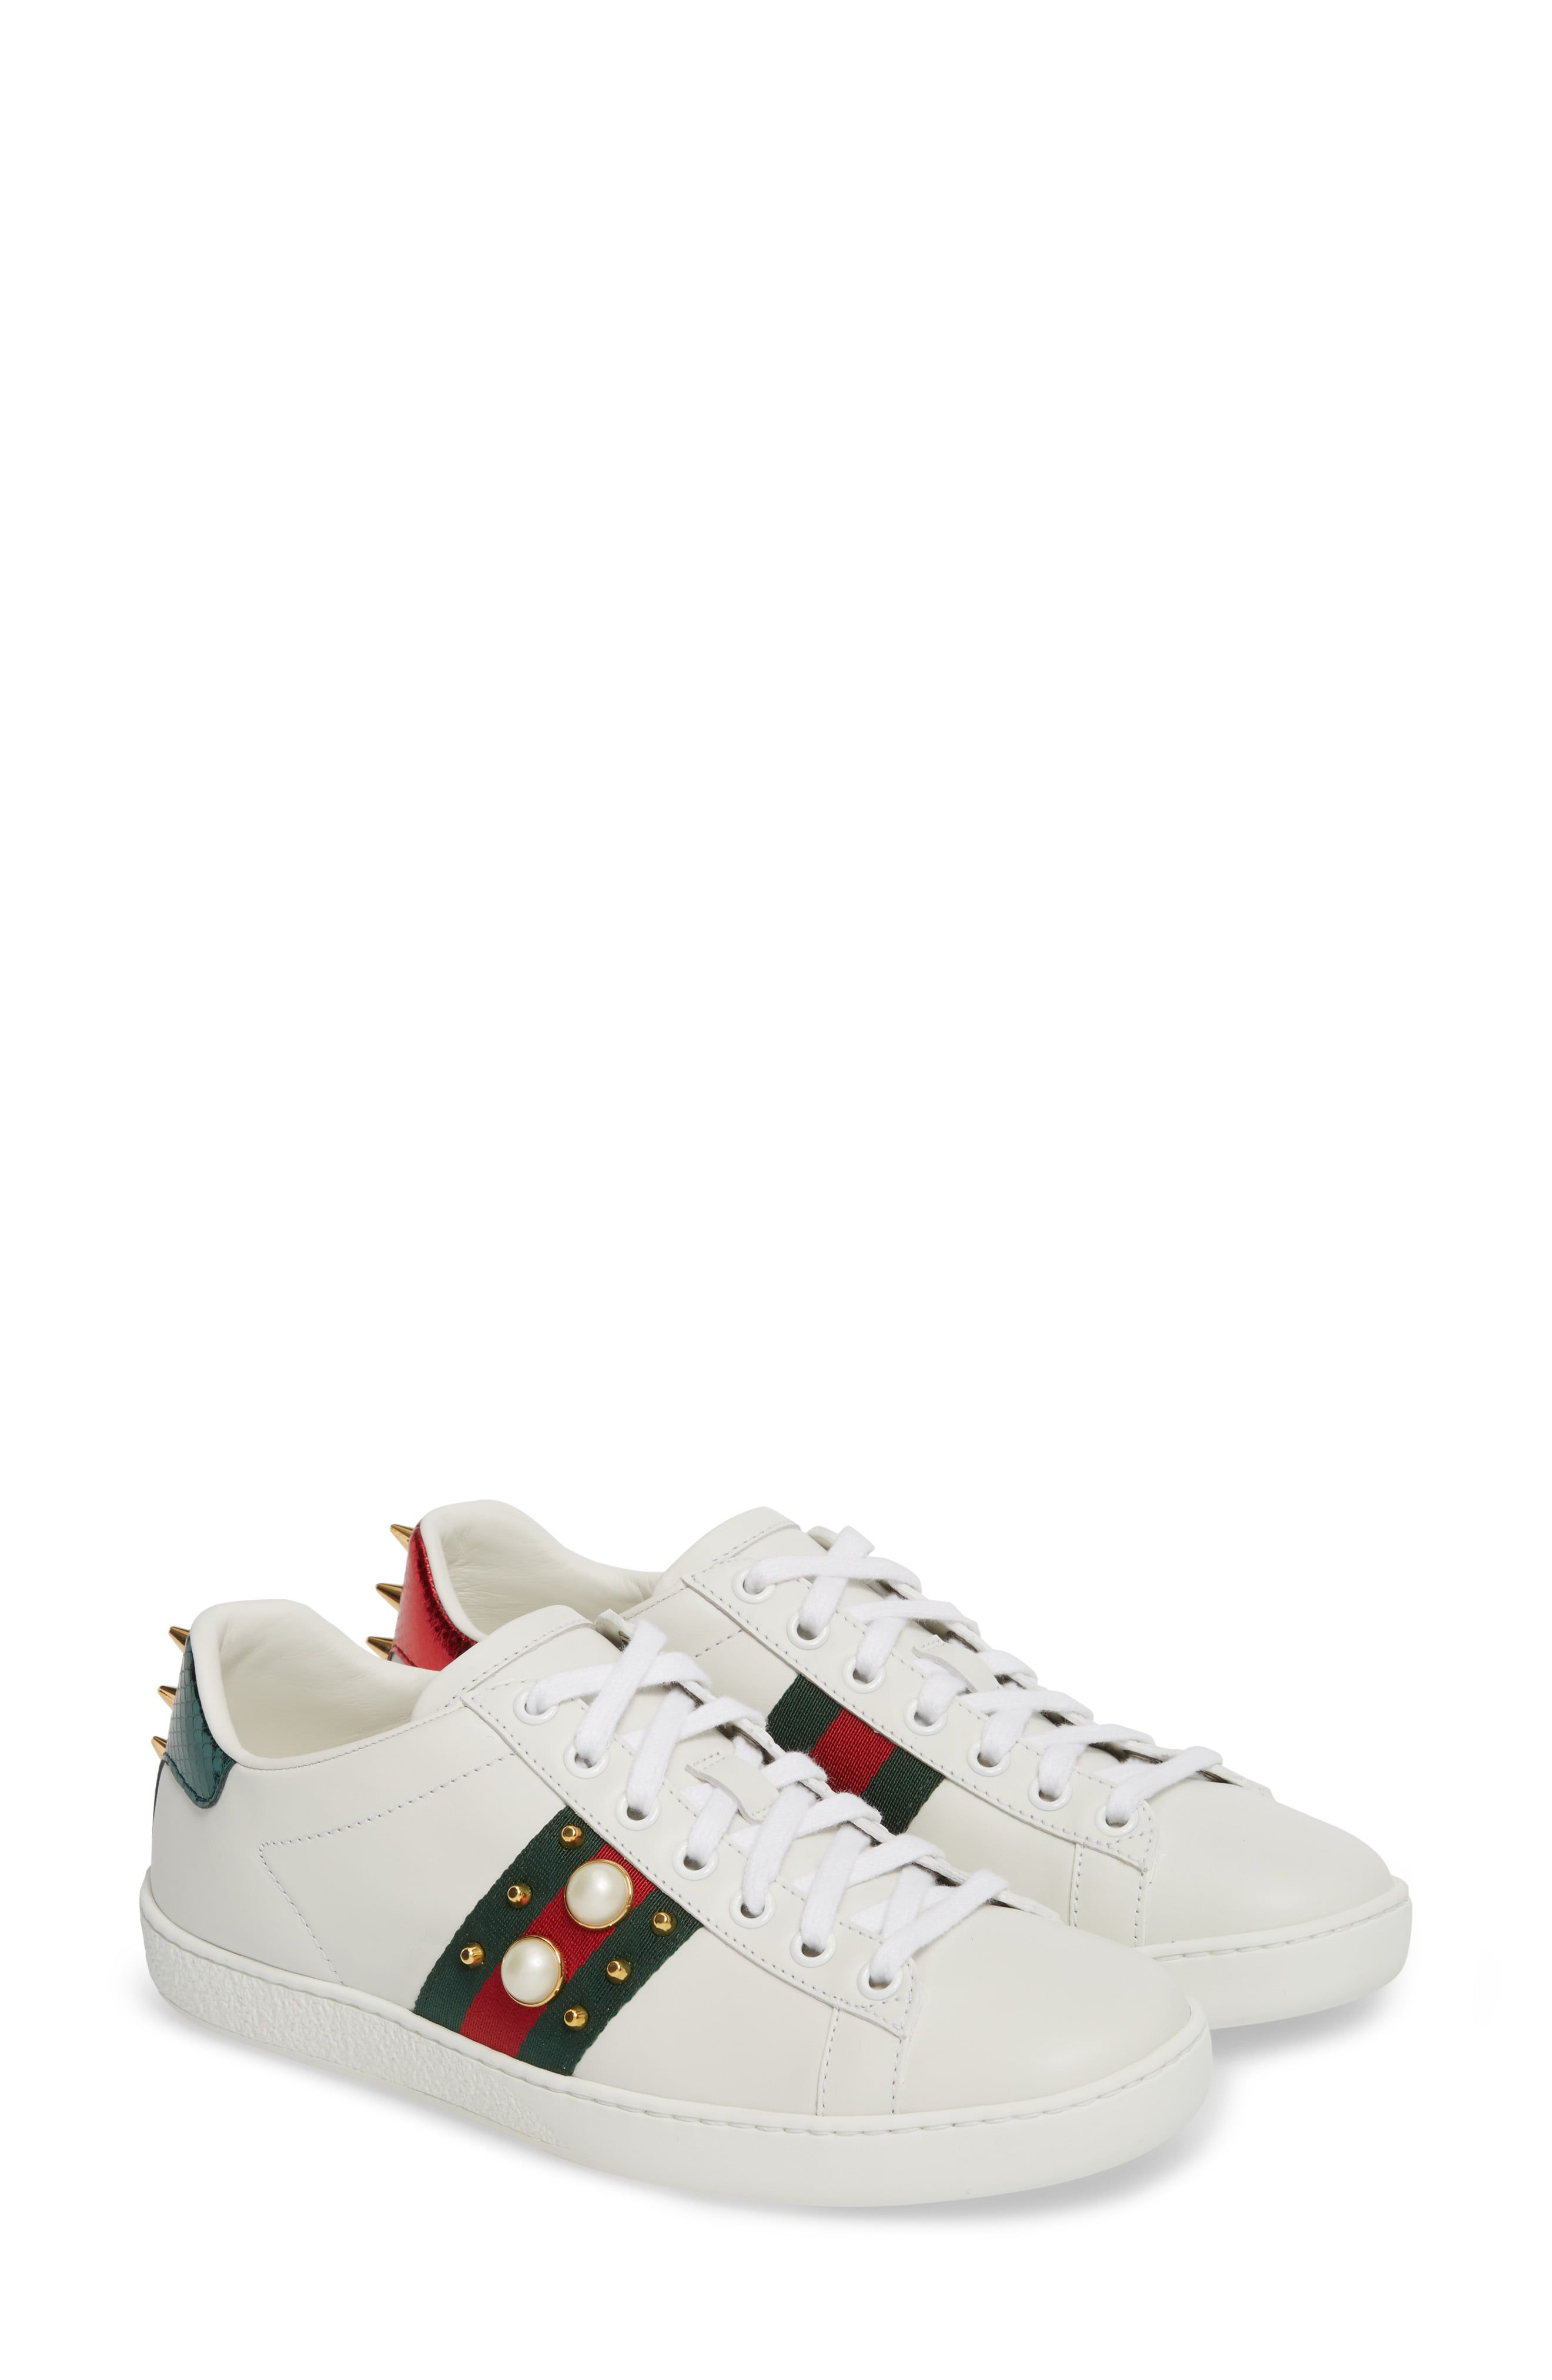 Women's Gucci New Ace Low Top Sneaker